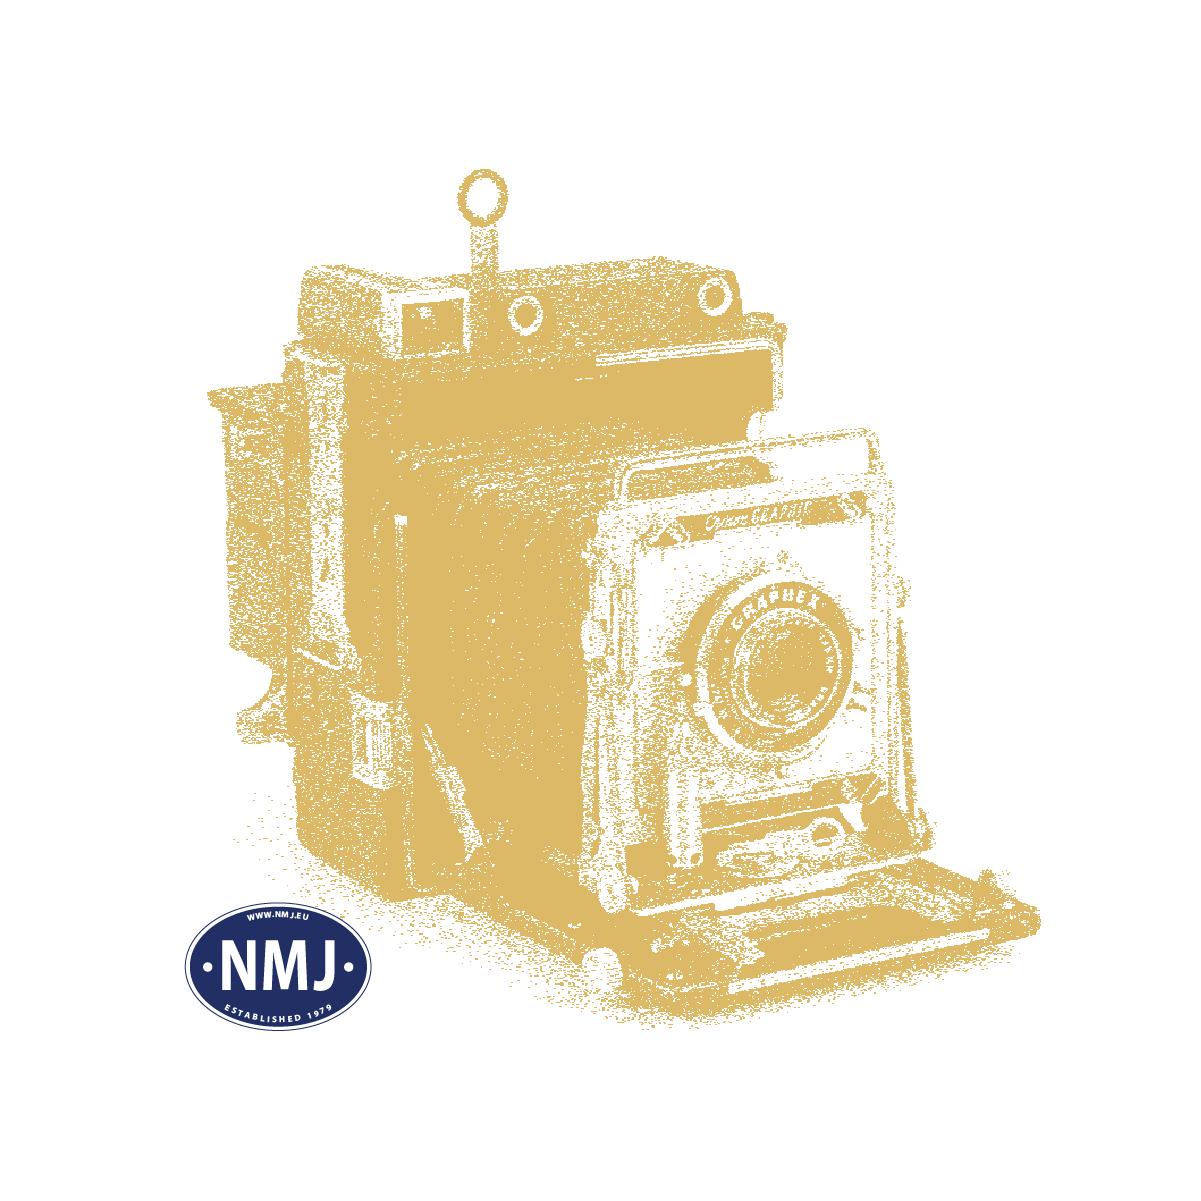 NMJS30b353 - NMJ Superline NSB Type 30b 353